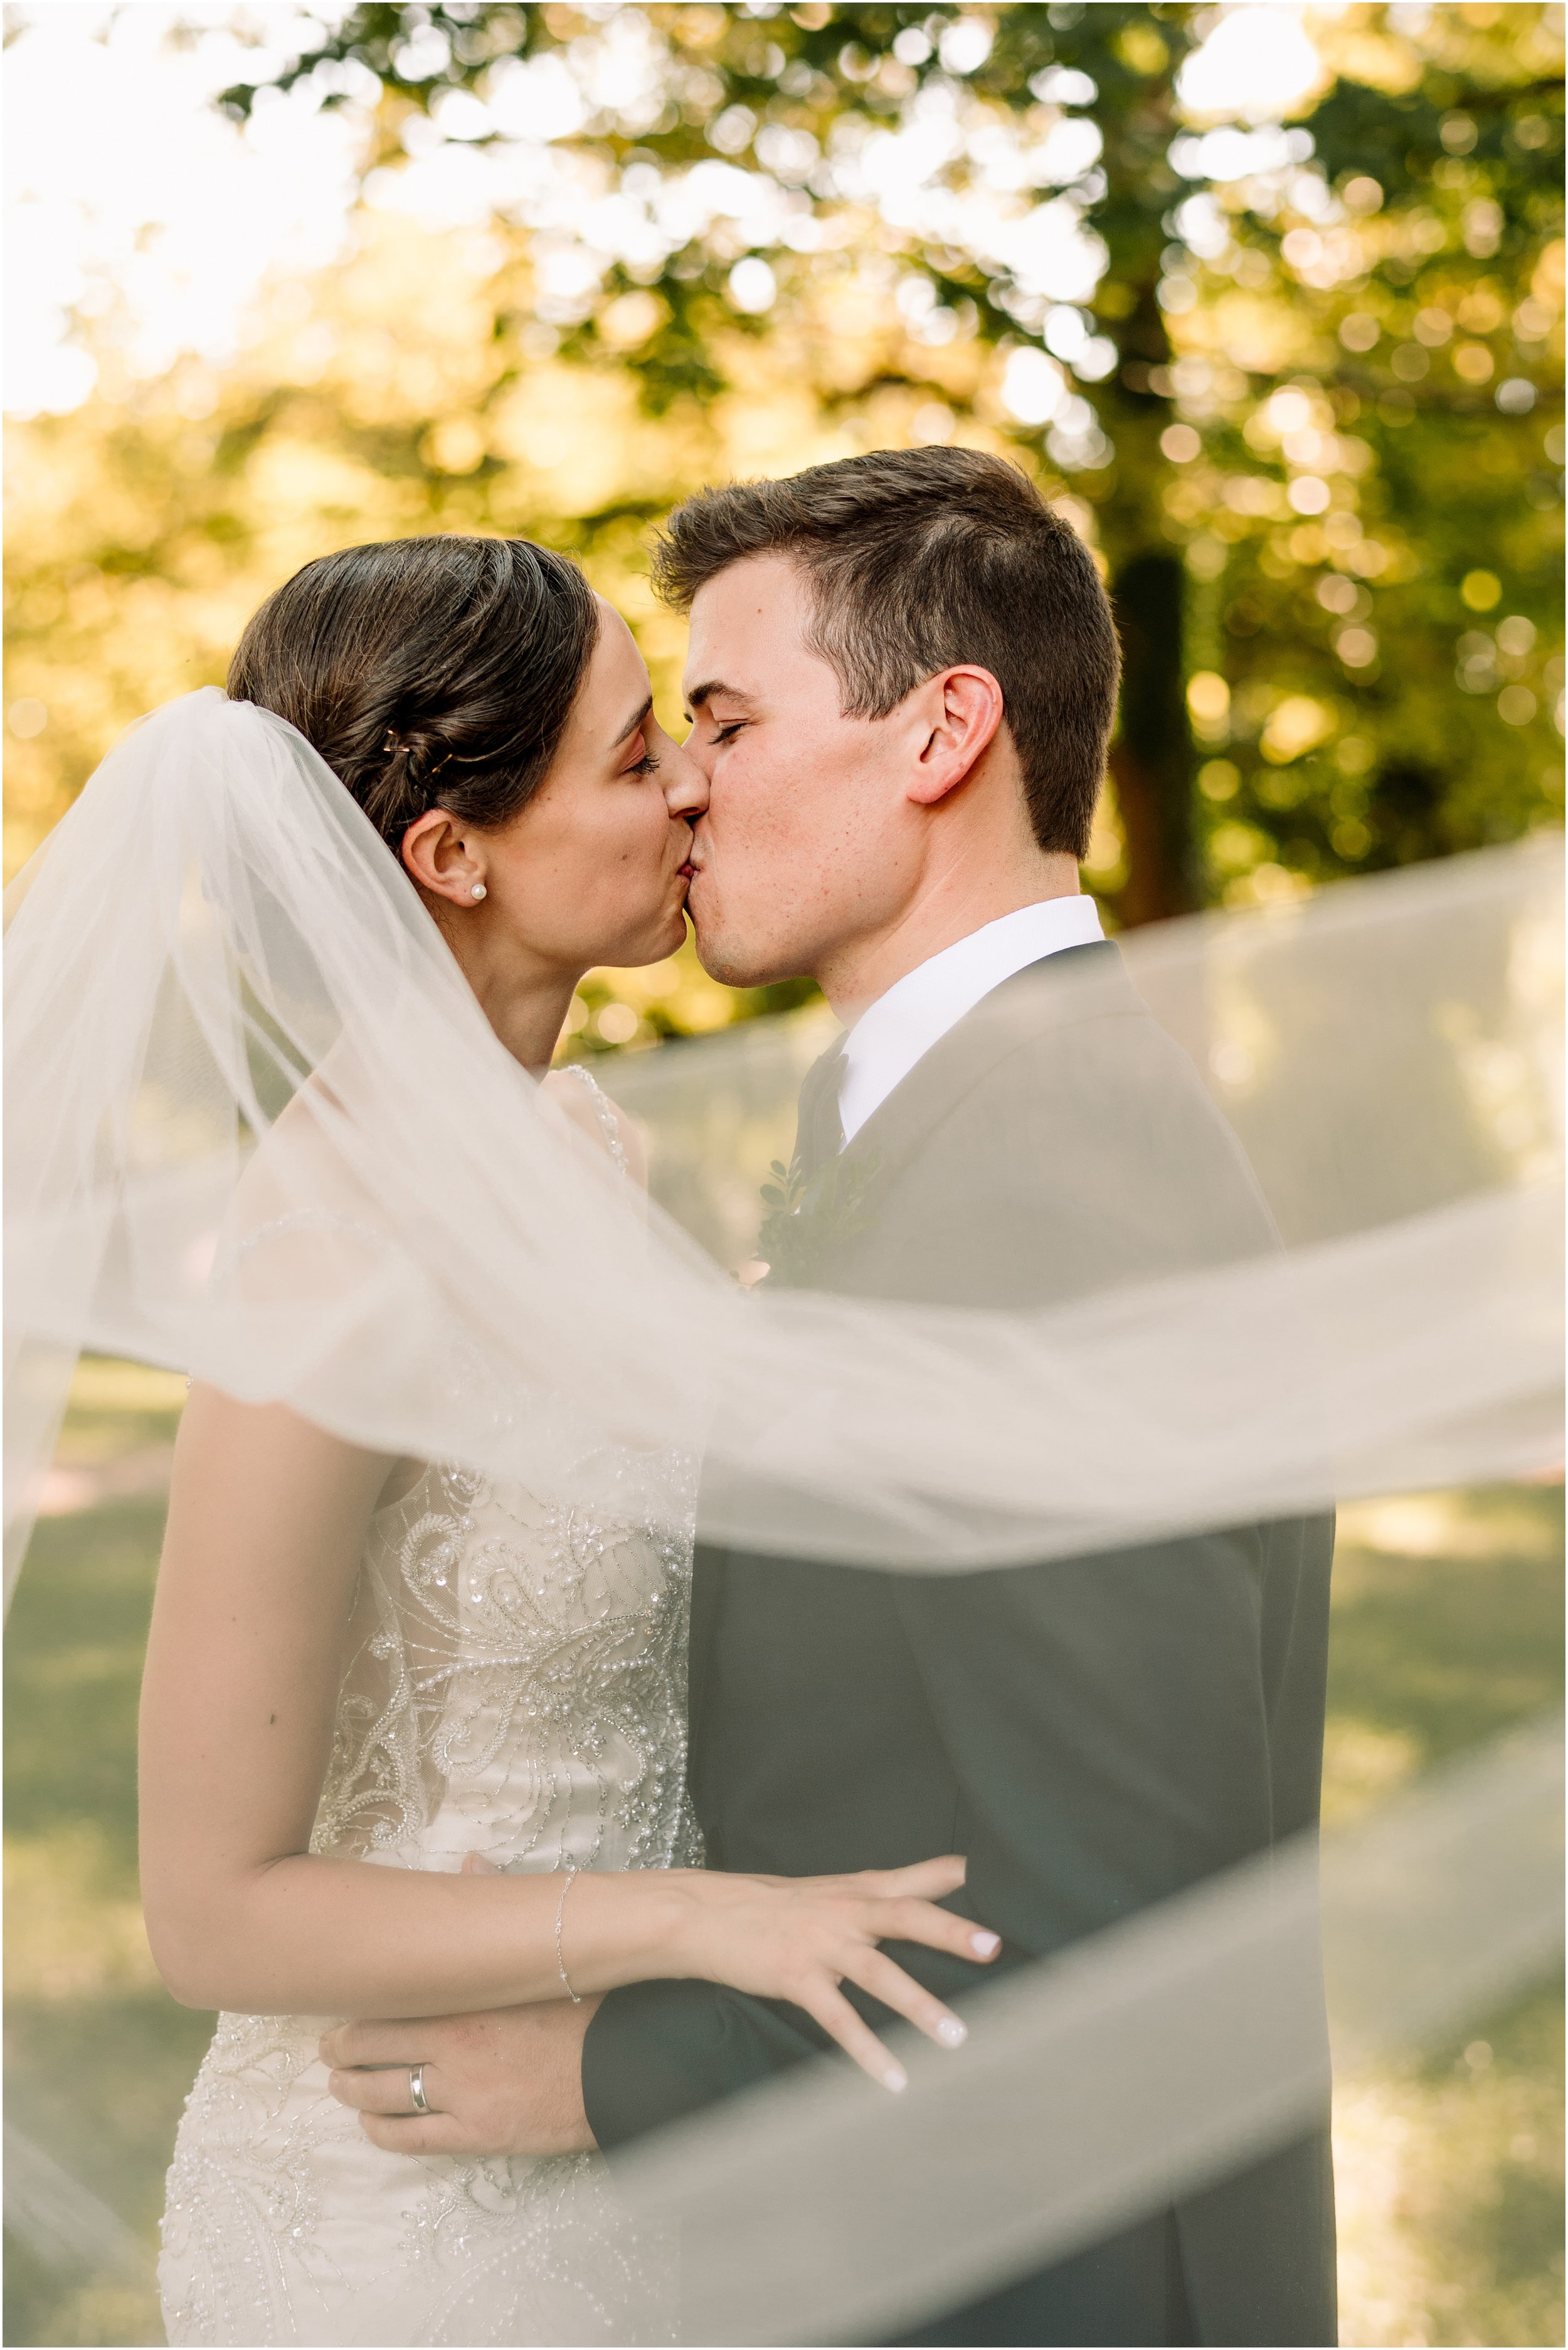 hannah leigh photography Antrim 1844 Wedding_1231.jpg